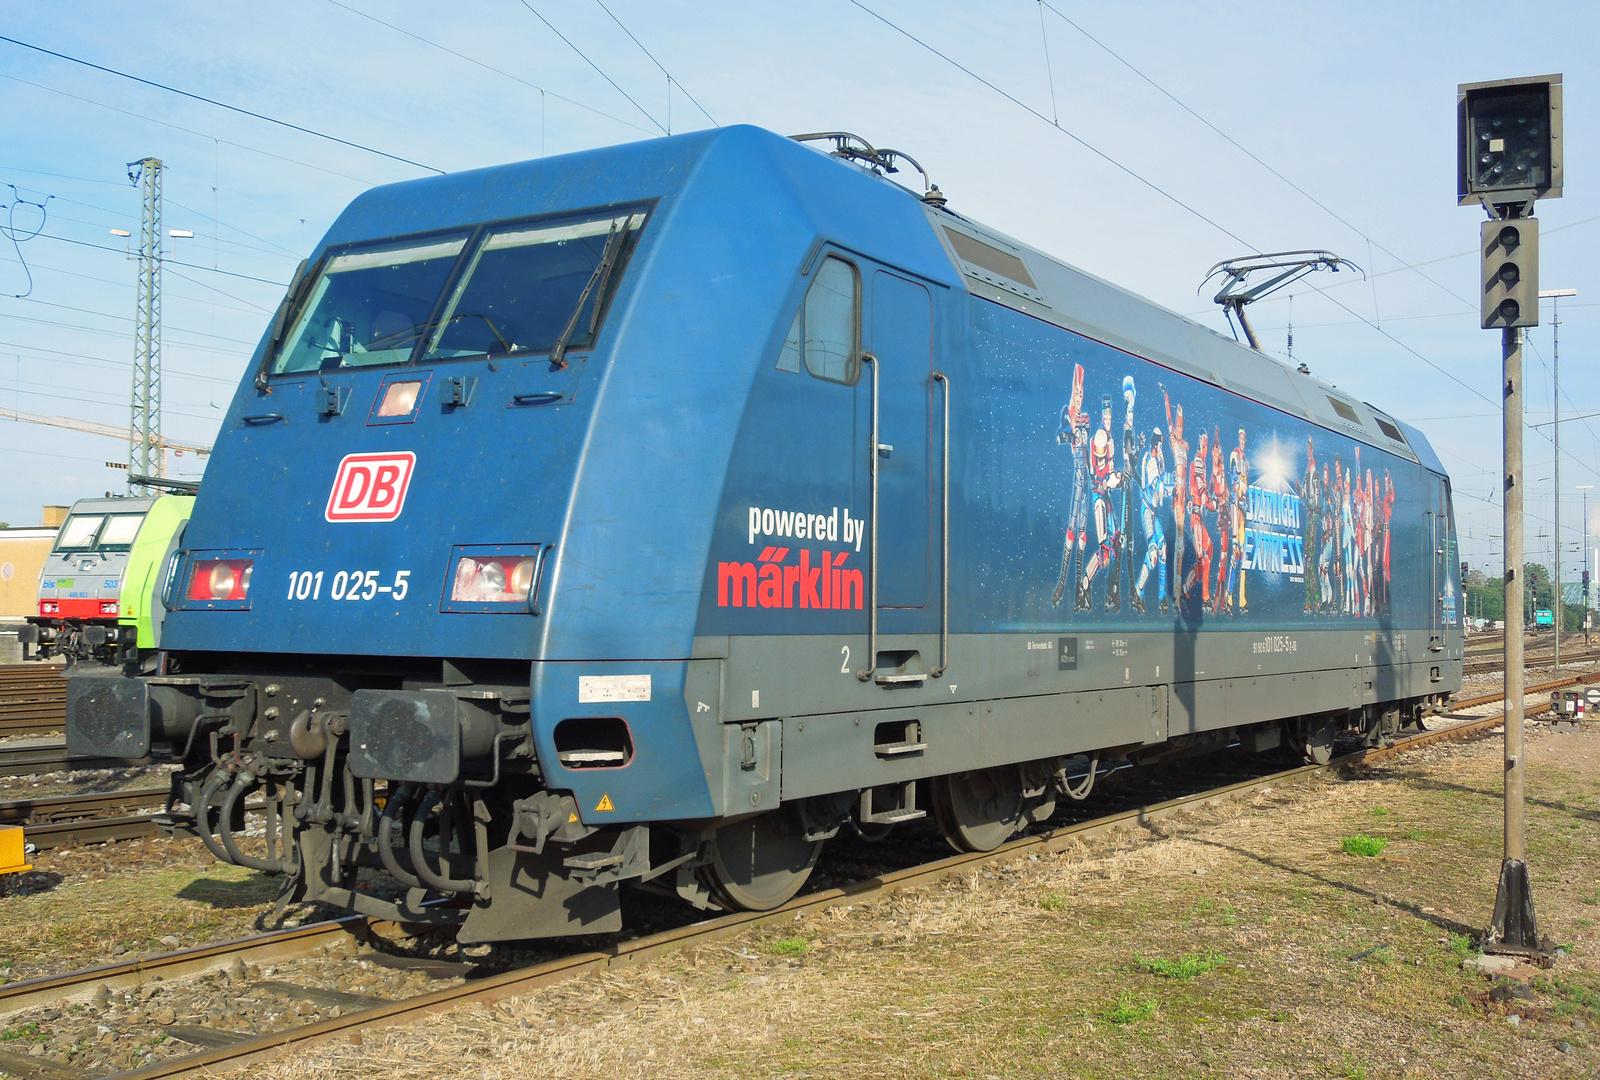 101 025-5 Starlight- Express in Basel Bad Bf